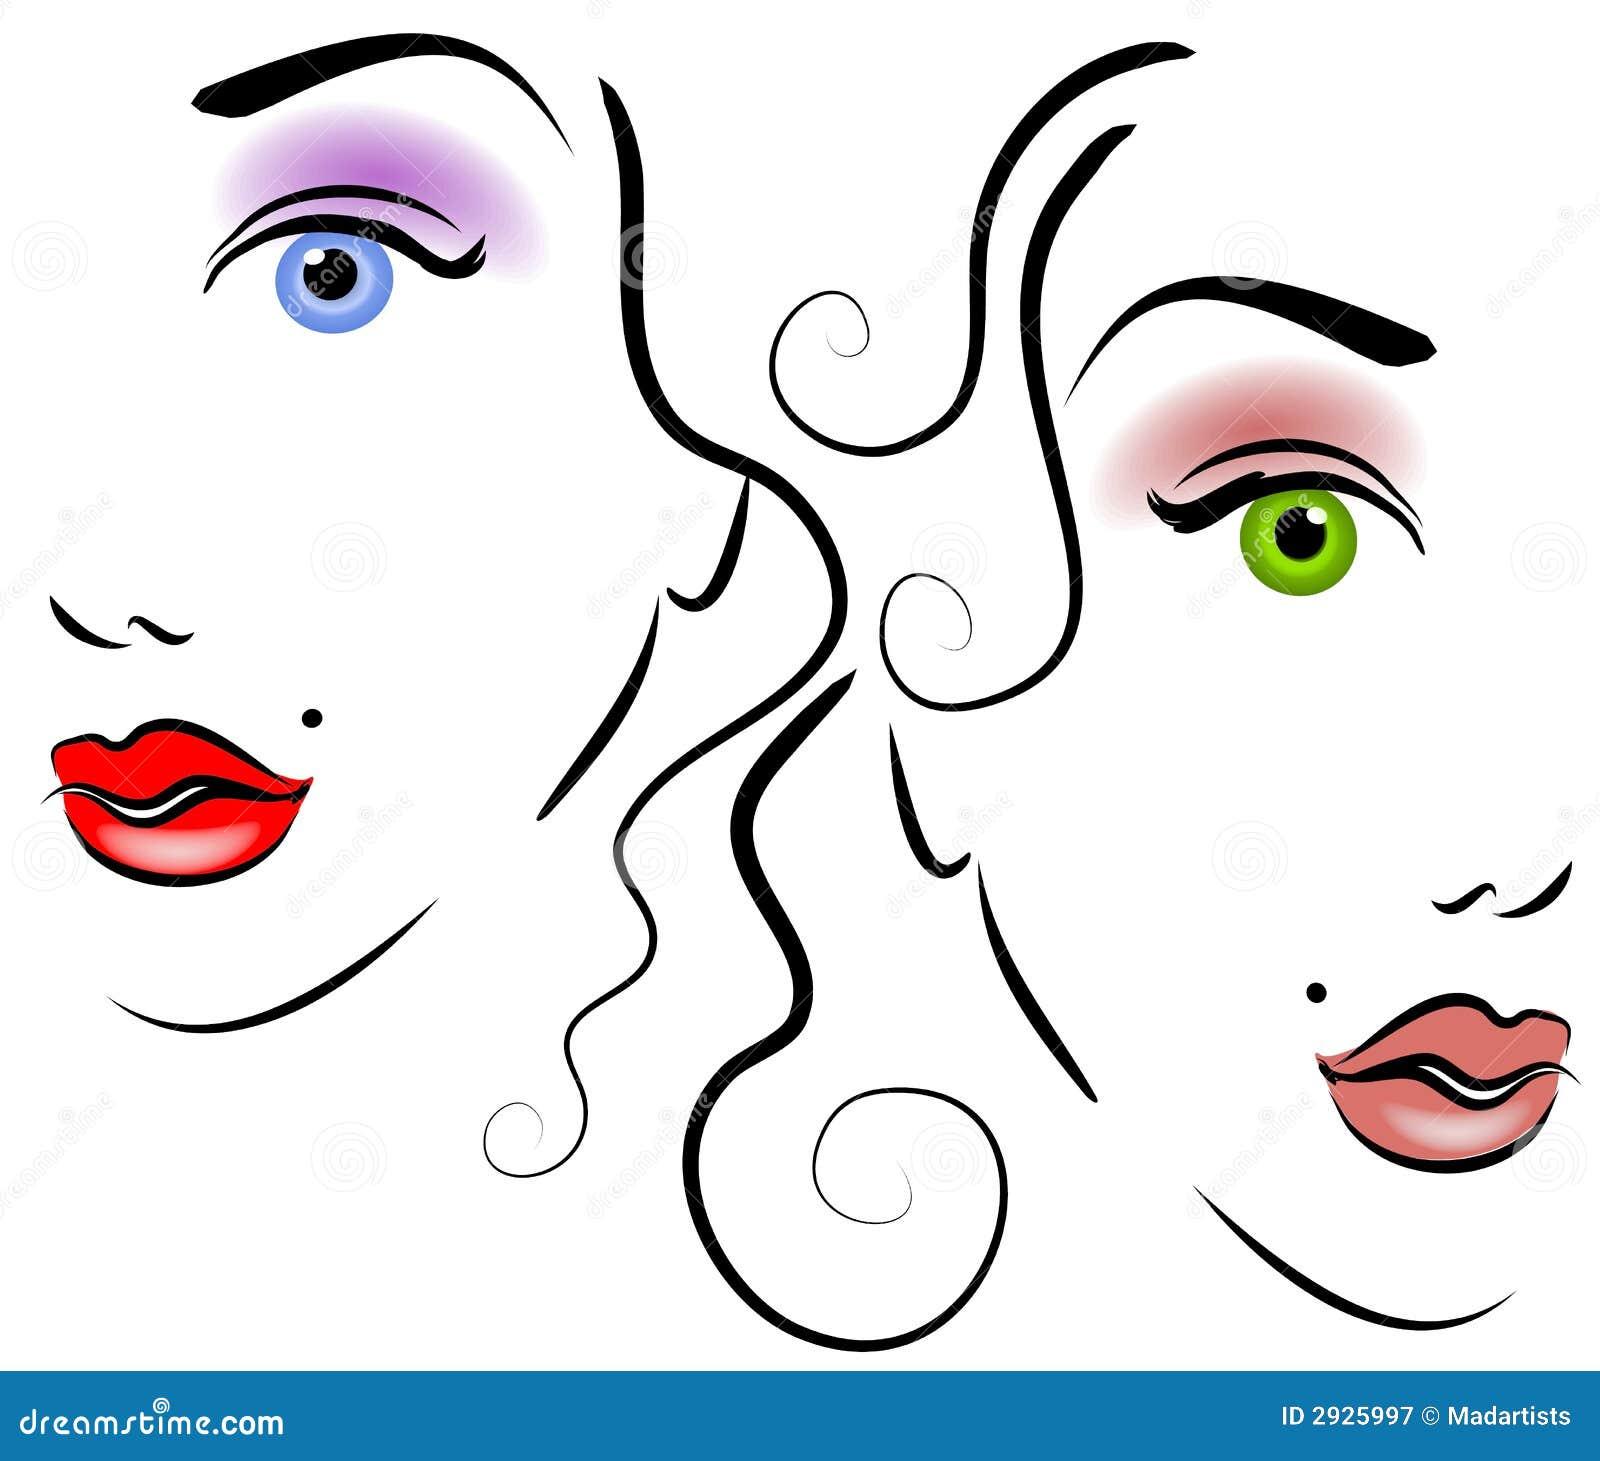 Faces of Women Clip Art 2